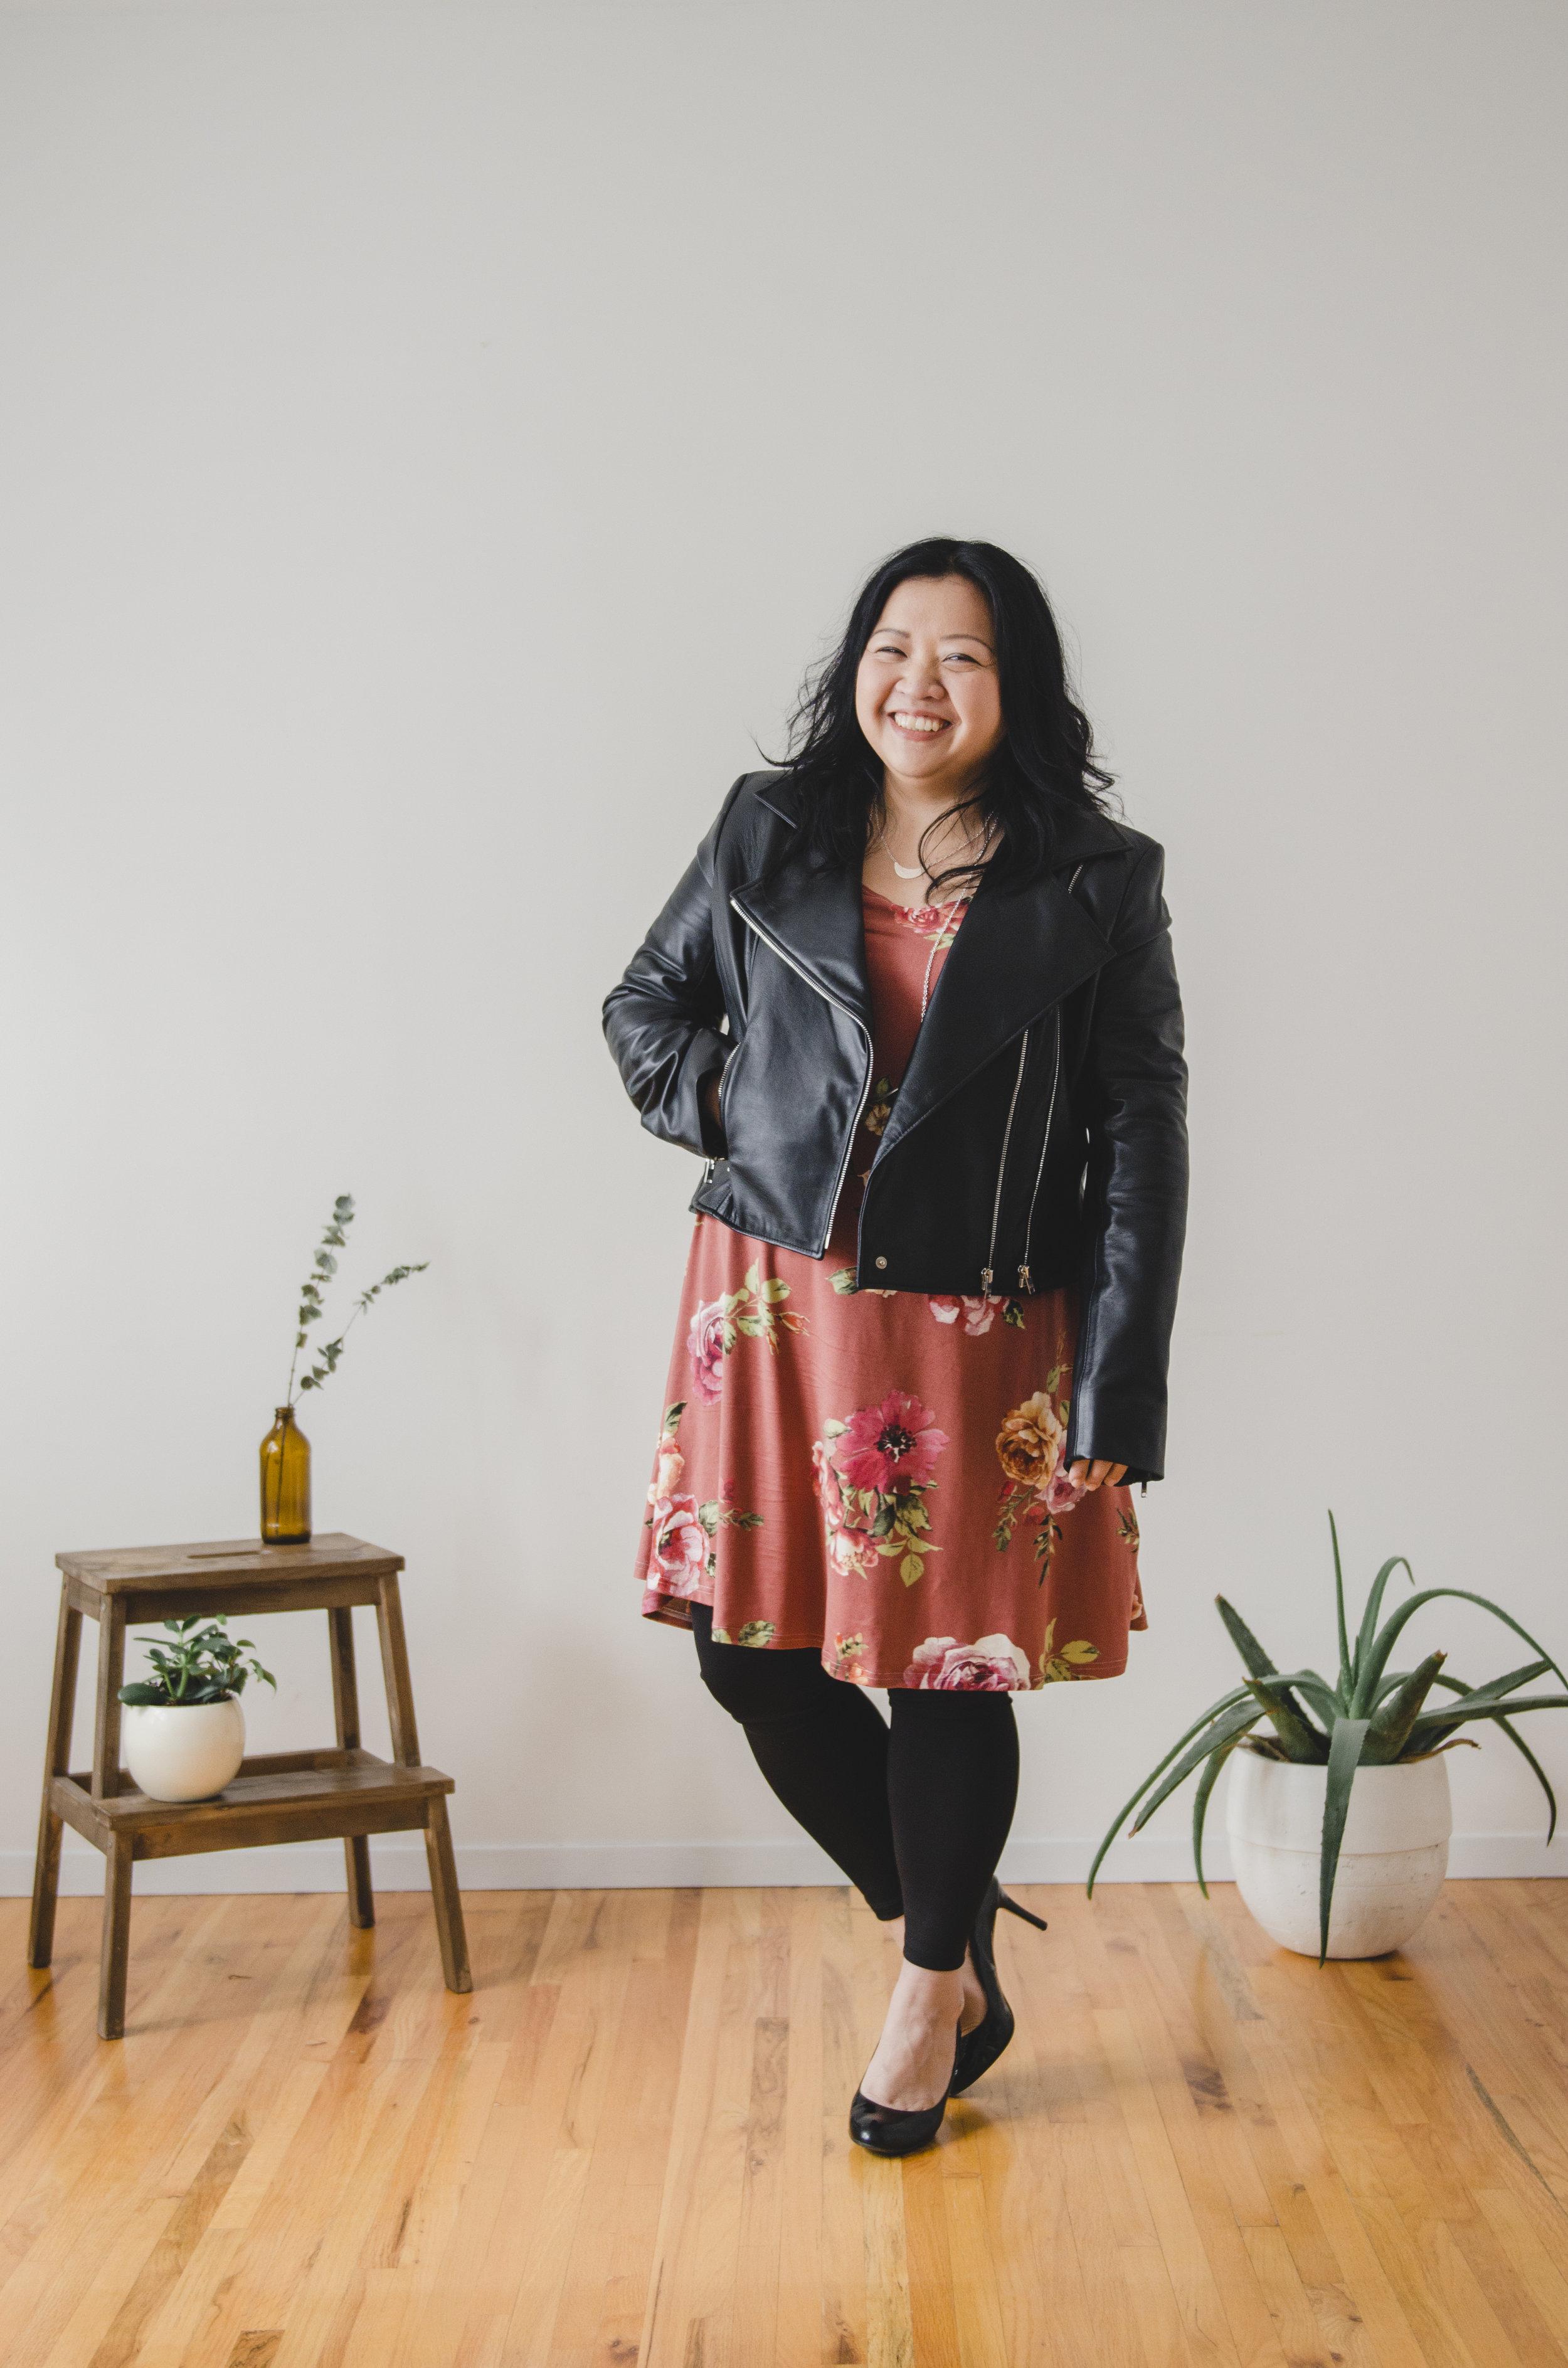 Long-sleeved Dress:  Kindred Clothing  Motorcycle Jacket:  Anneke Forbes  Jewellery:  Kari Woo  Tights:  Riyoko   Photography:  Ally C Tran  | Model:  Helen Youn